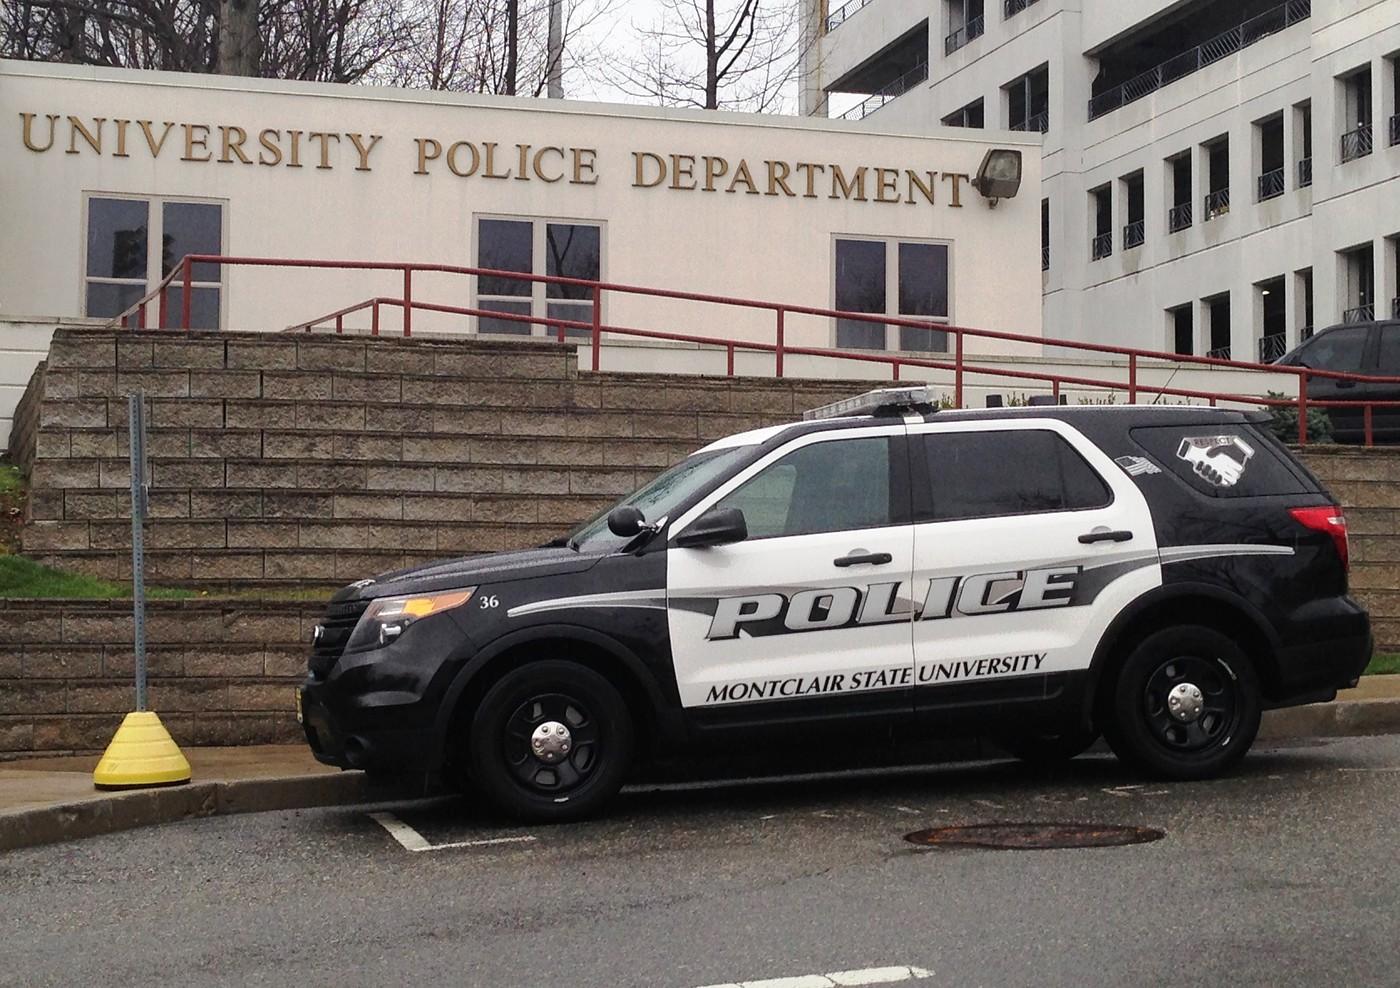 NJ - Montclair State University Campus Police